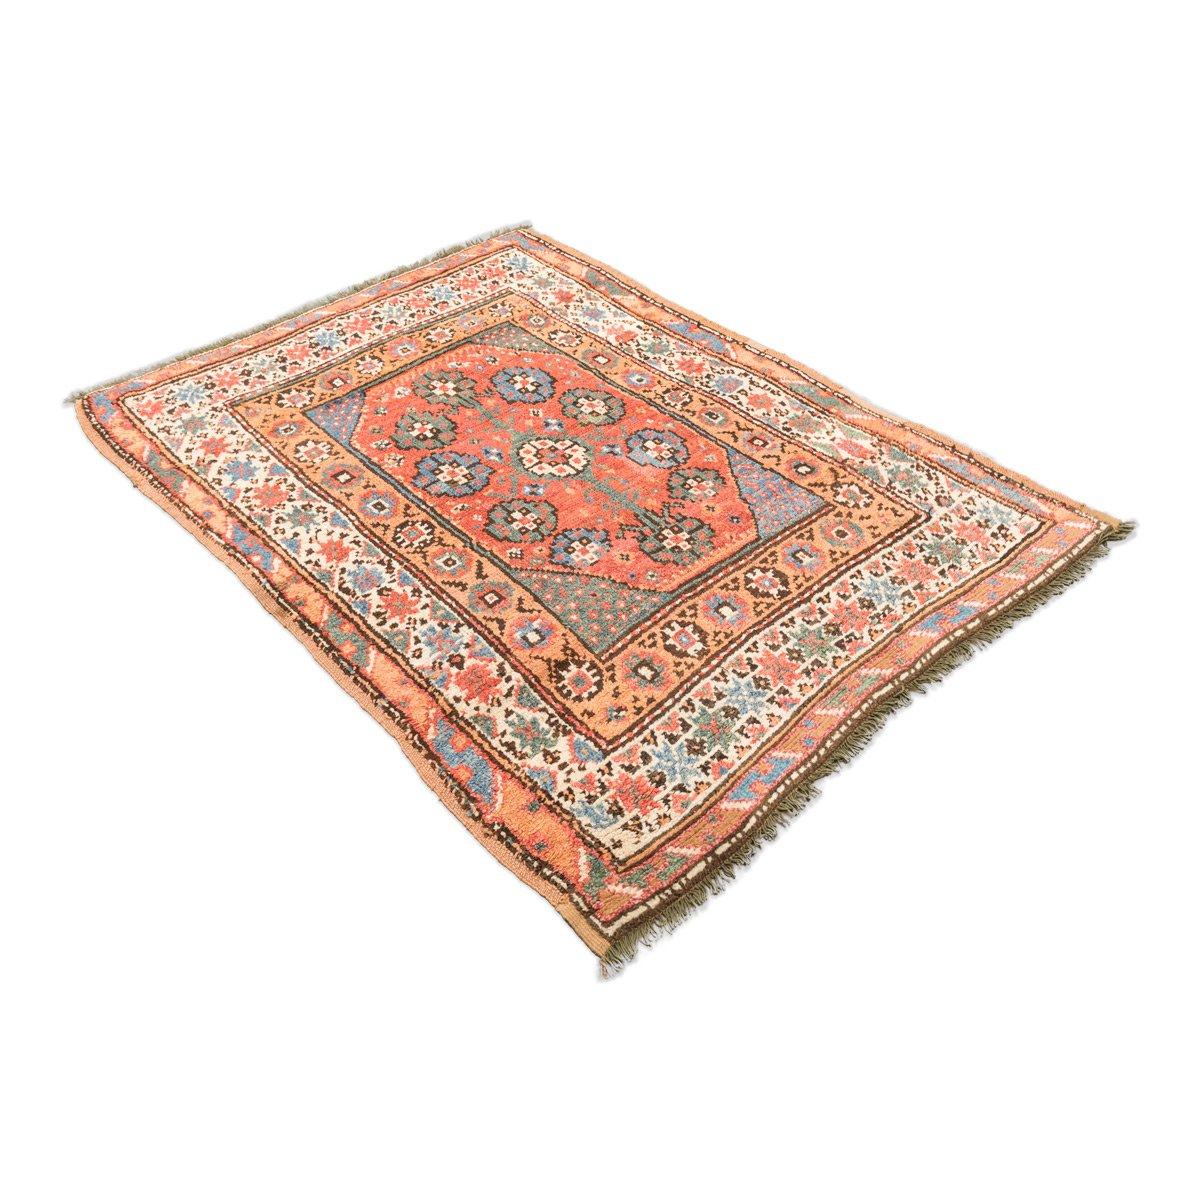 Antique Vintage Turkish Rugs: Antique Turkish Bergama Rug For Sale At Pamono